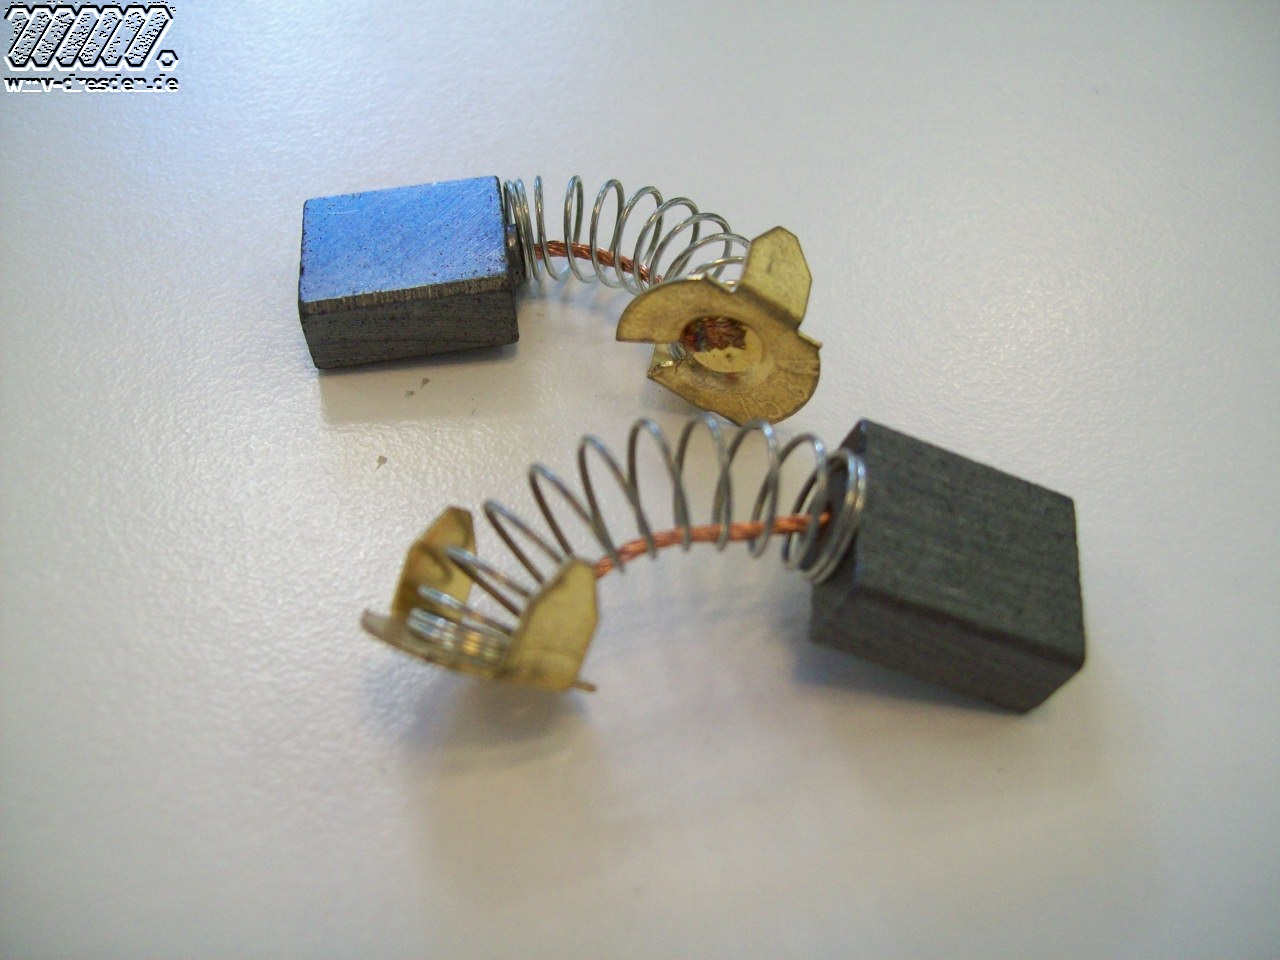 Kohlebürstenpaar neue Ausführung, ab Bj 09-2009, 13,4 mm breit, 6,4 mm dick, 15 mm lang, passend zu Bürstenkappe Ø18 mm